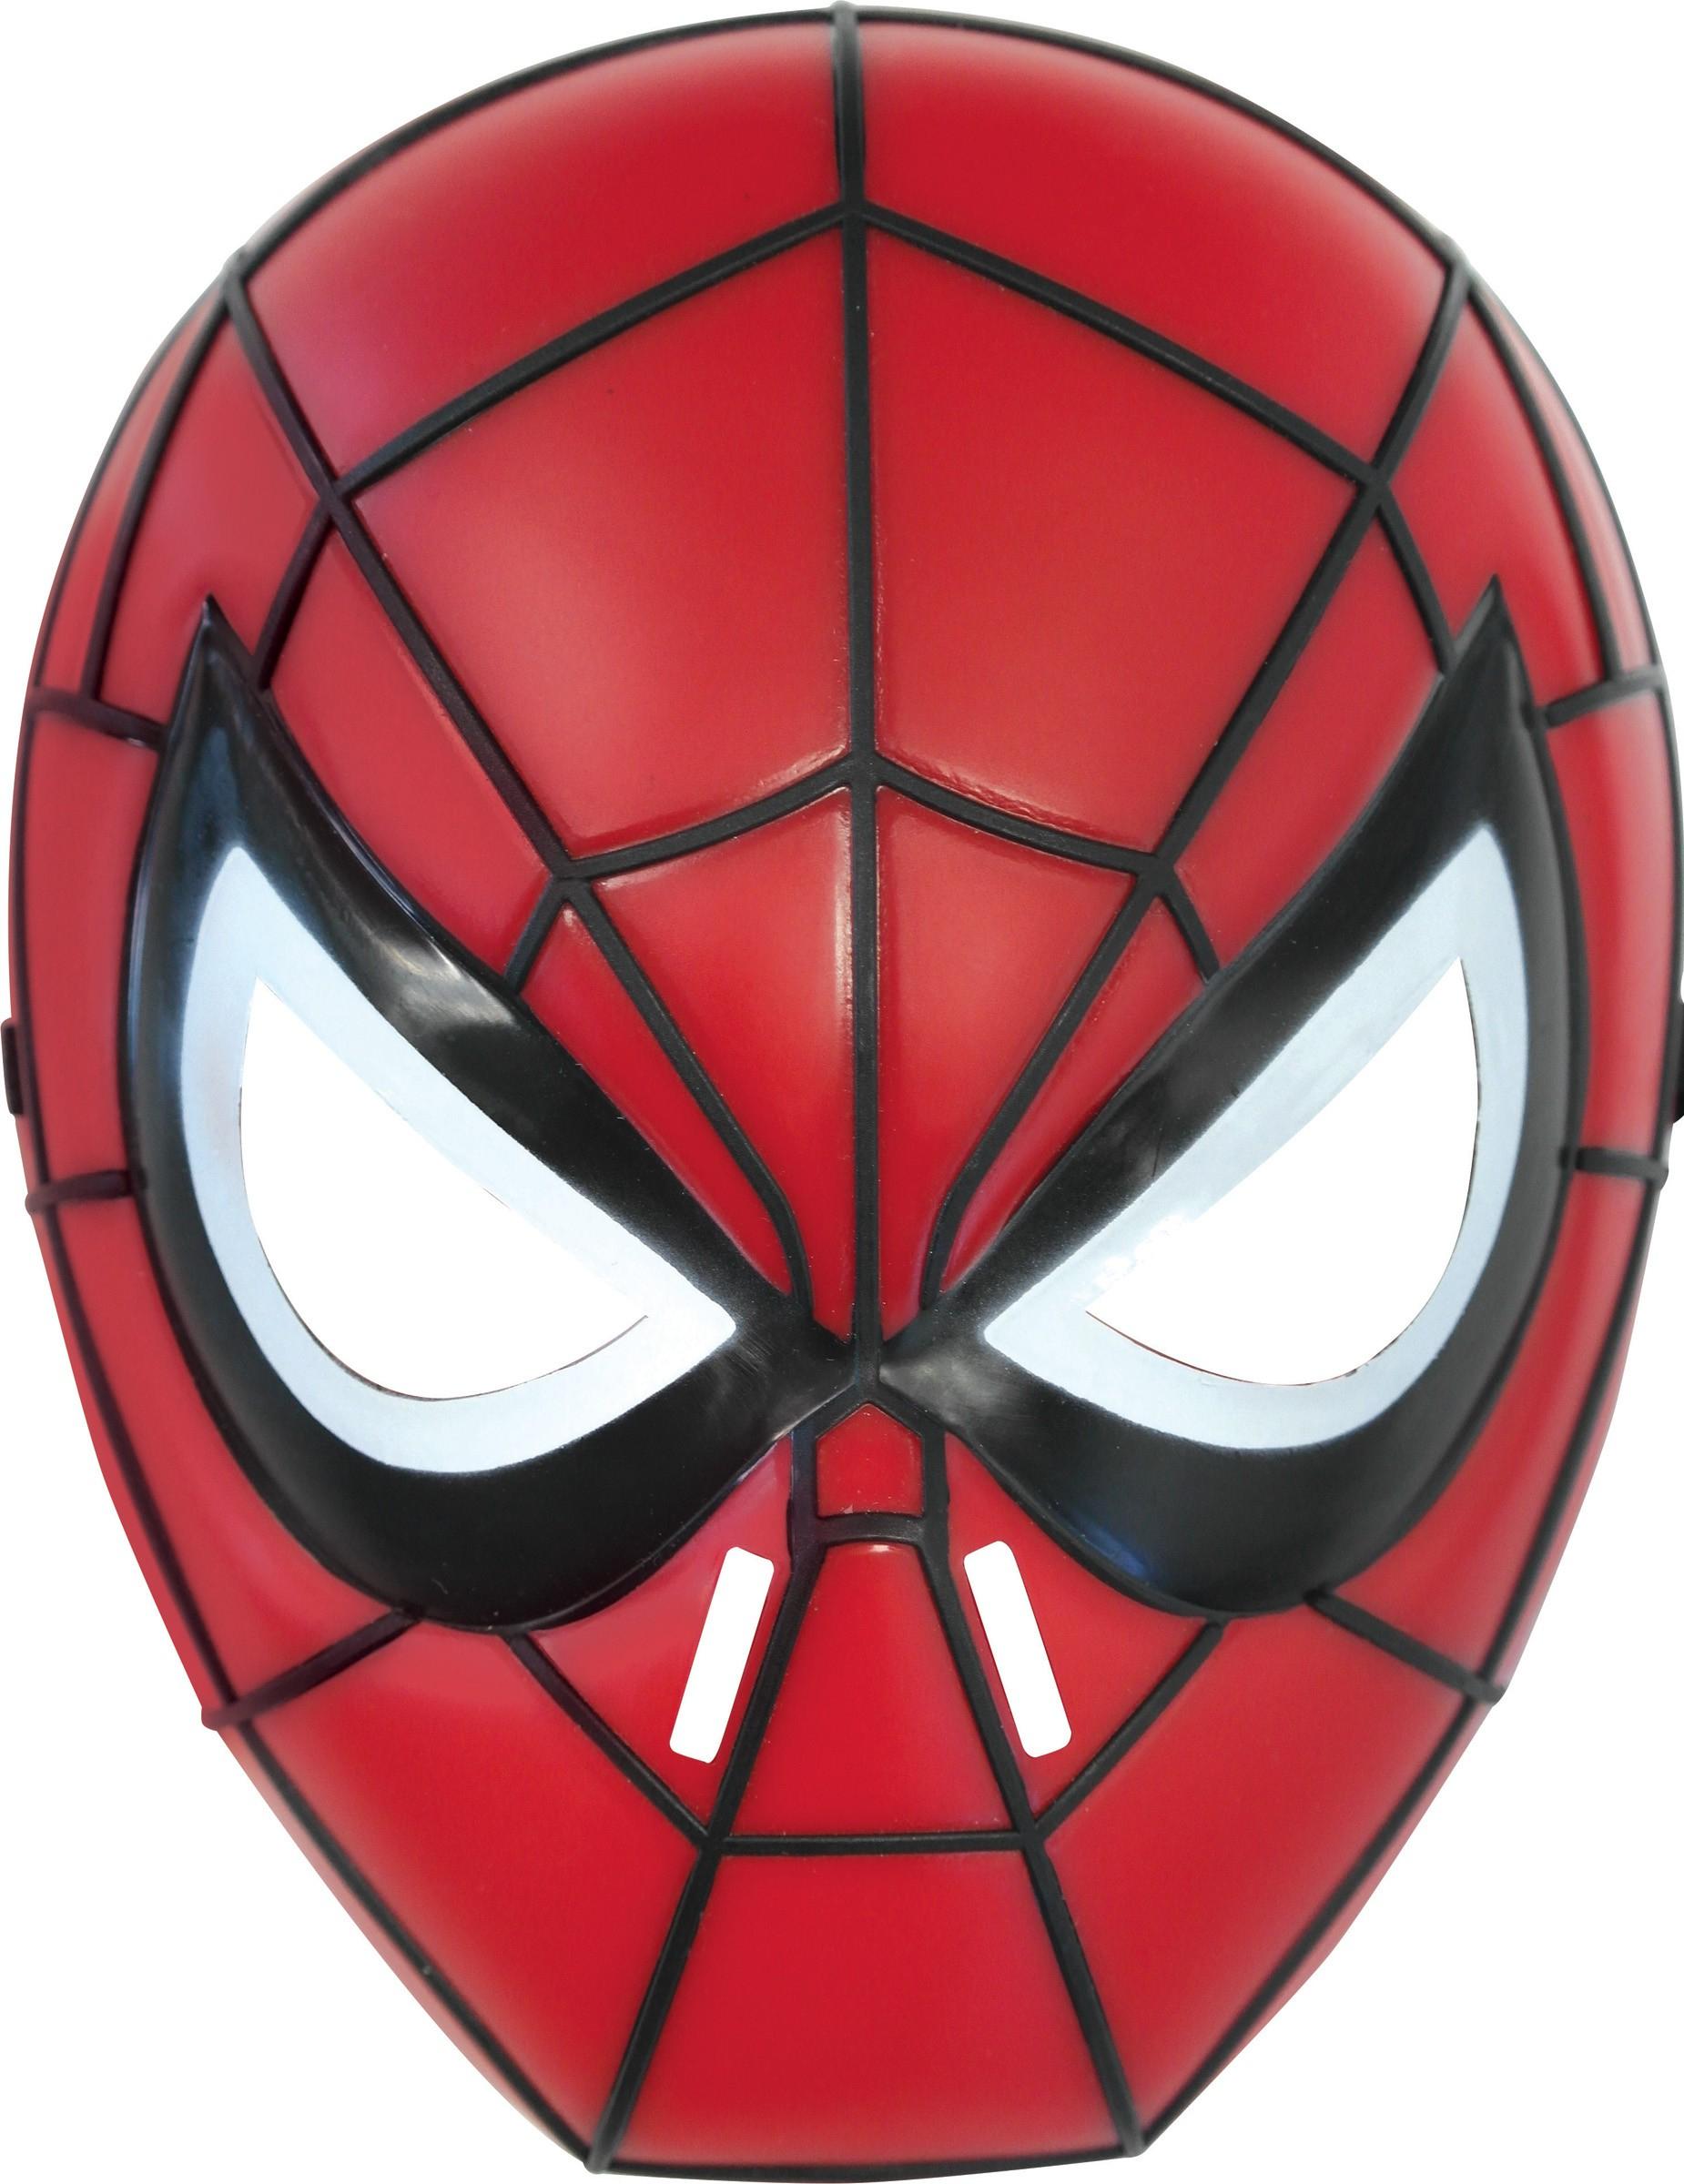 Masque Spiderman™ Rigide Enfant concernant Masque Spiderman A Imprimer